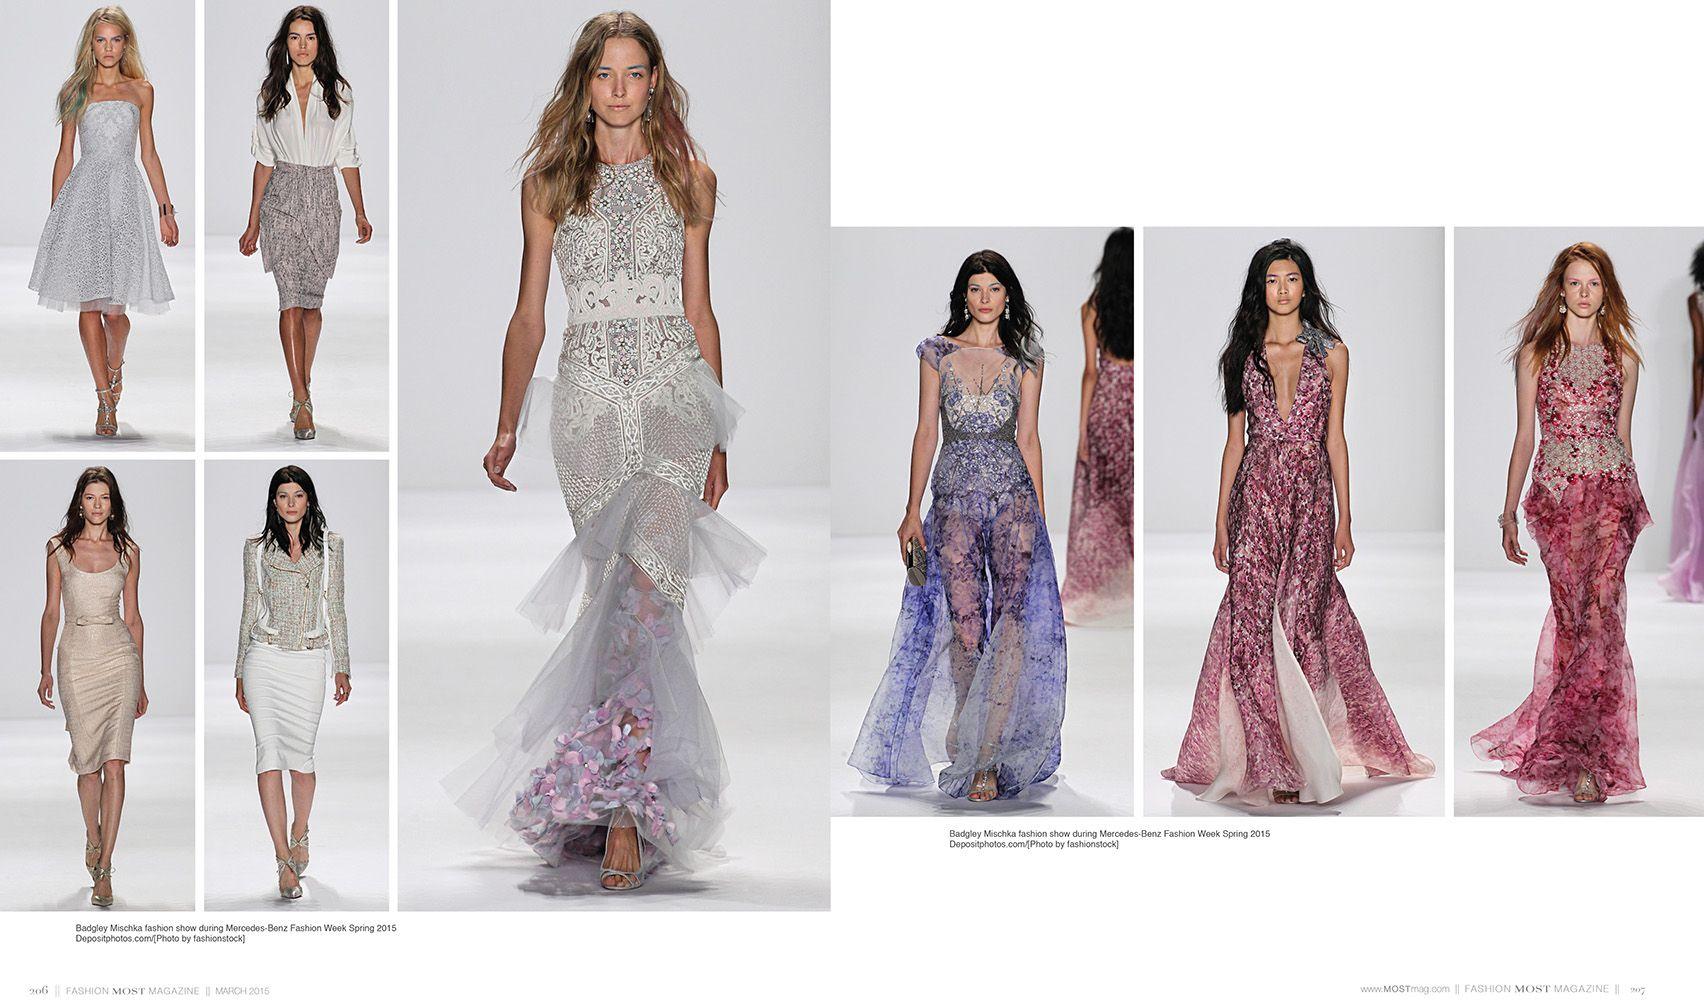 Badgley Mischka Fashion Show during Mercedes-Benz Fashion Week Spring / Summer Collection 2015 Image Credit: © Depositphotos.com / fashionstock #mostmag #Badgleymischka http://mostmag.com/fashion/badgley-mischka/ http://online.pubhtml5.com/dvie/ynee/#p=206-207